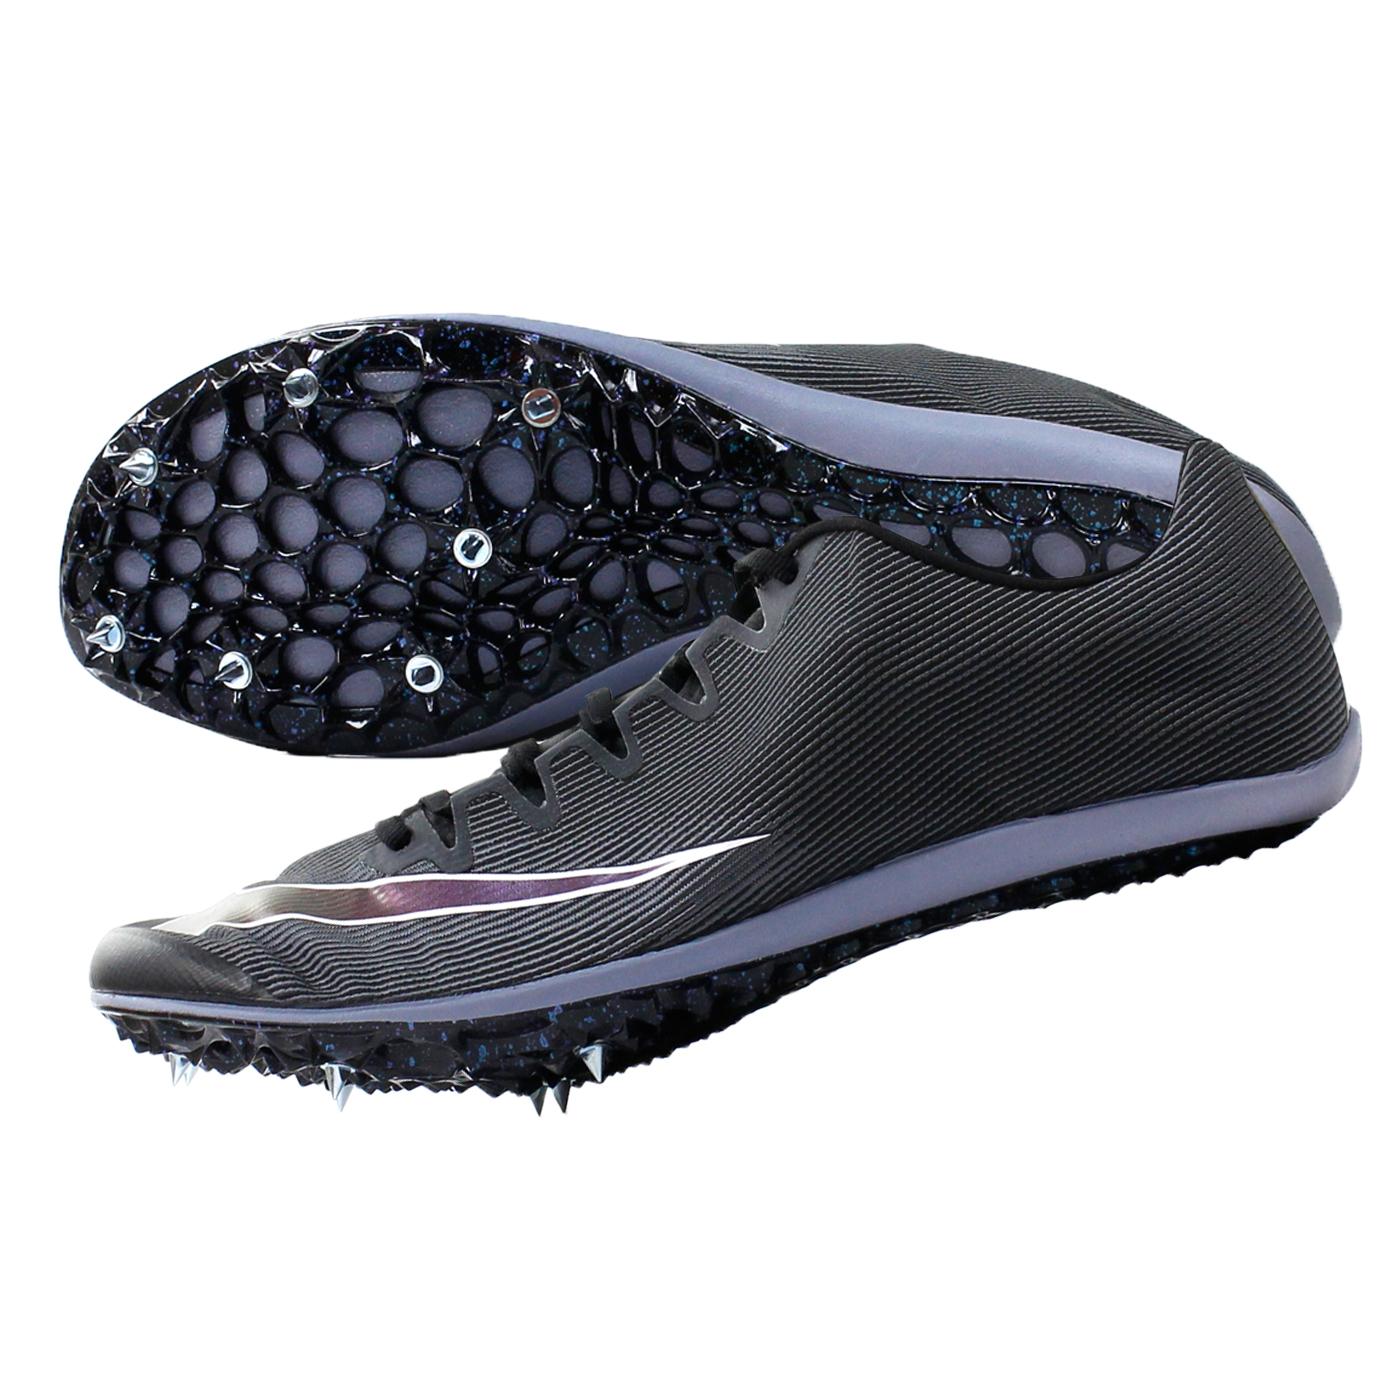 NIKE 田徑釘鞋(短距離)  @ZOOM 400@AA1205005